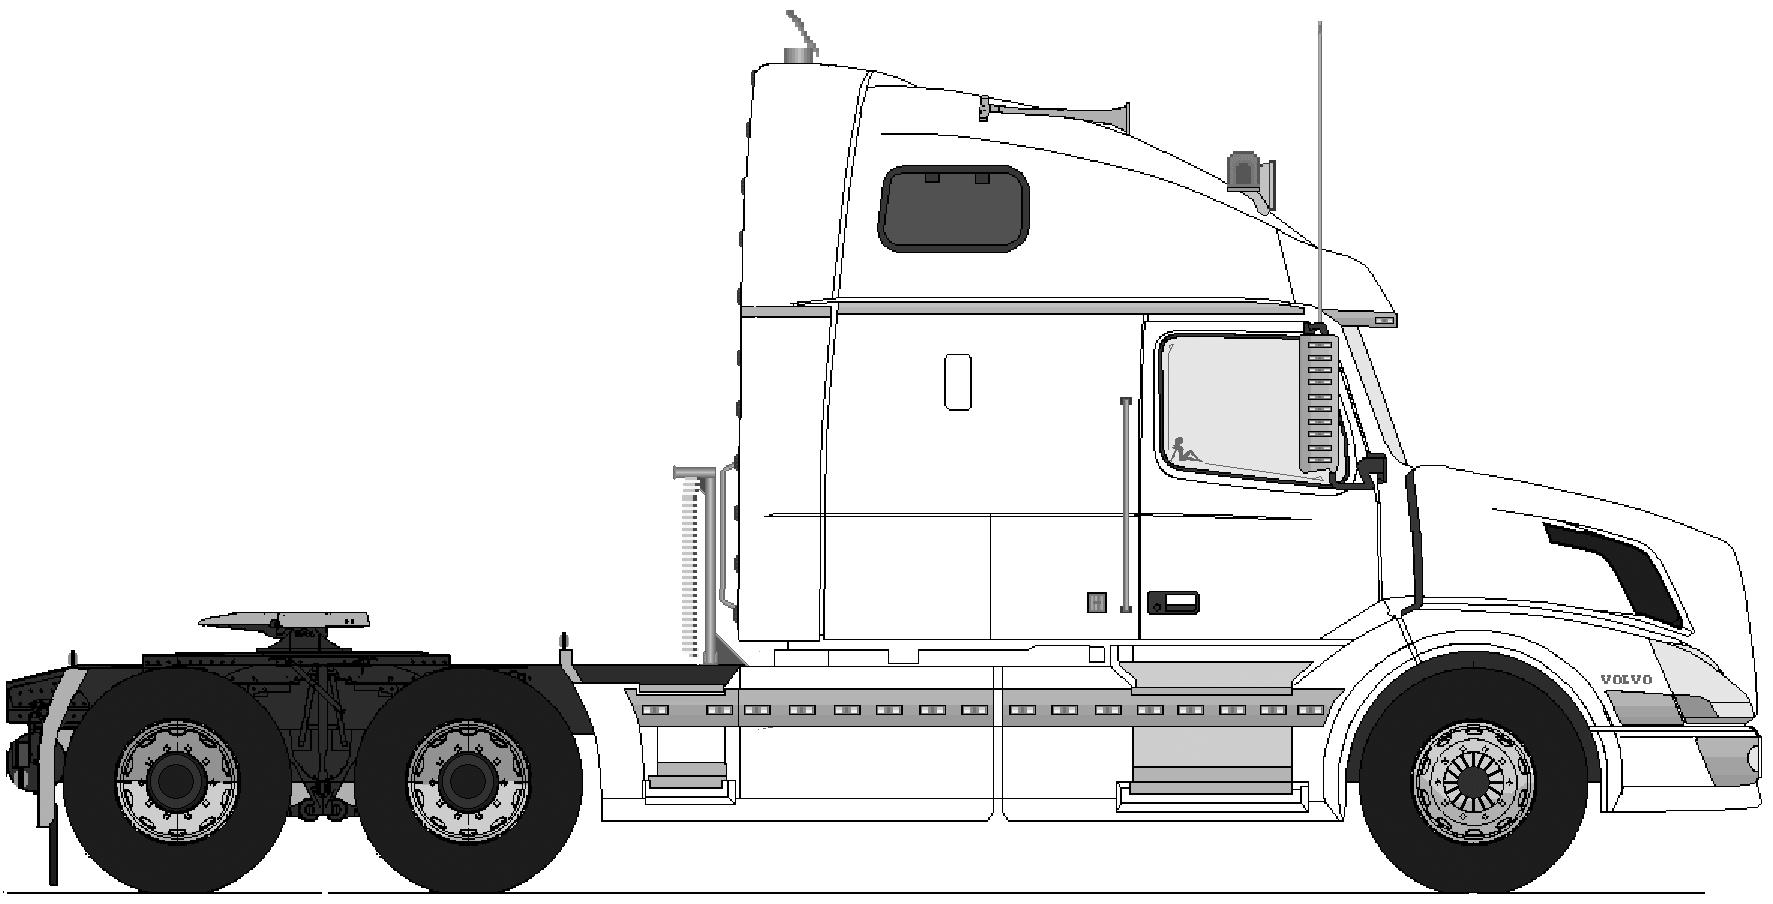 Volvo Vn770 6x4 Heavy Truck Blueprints Free